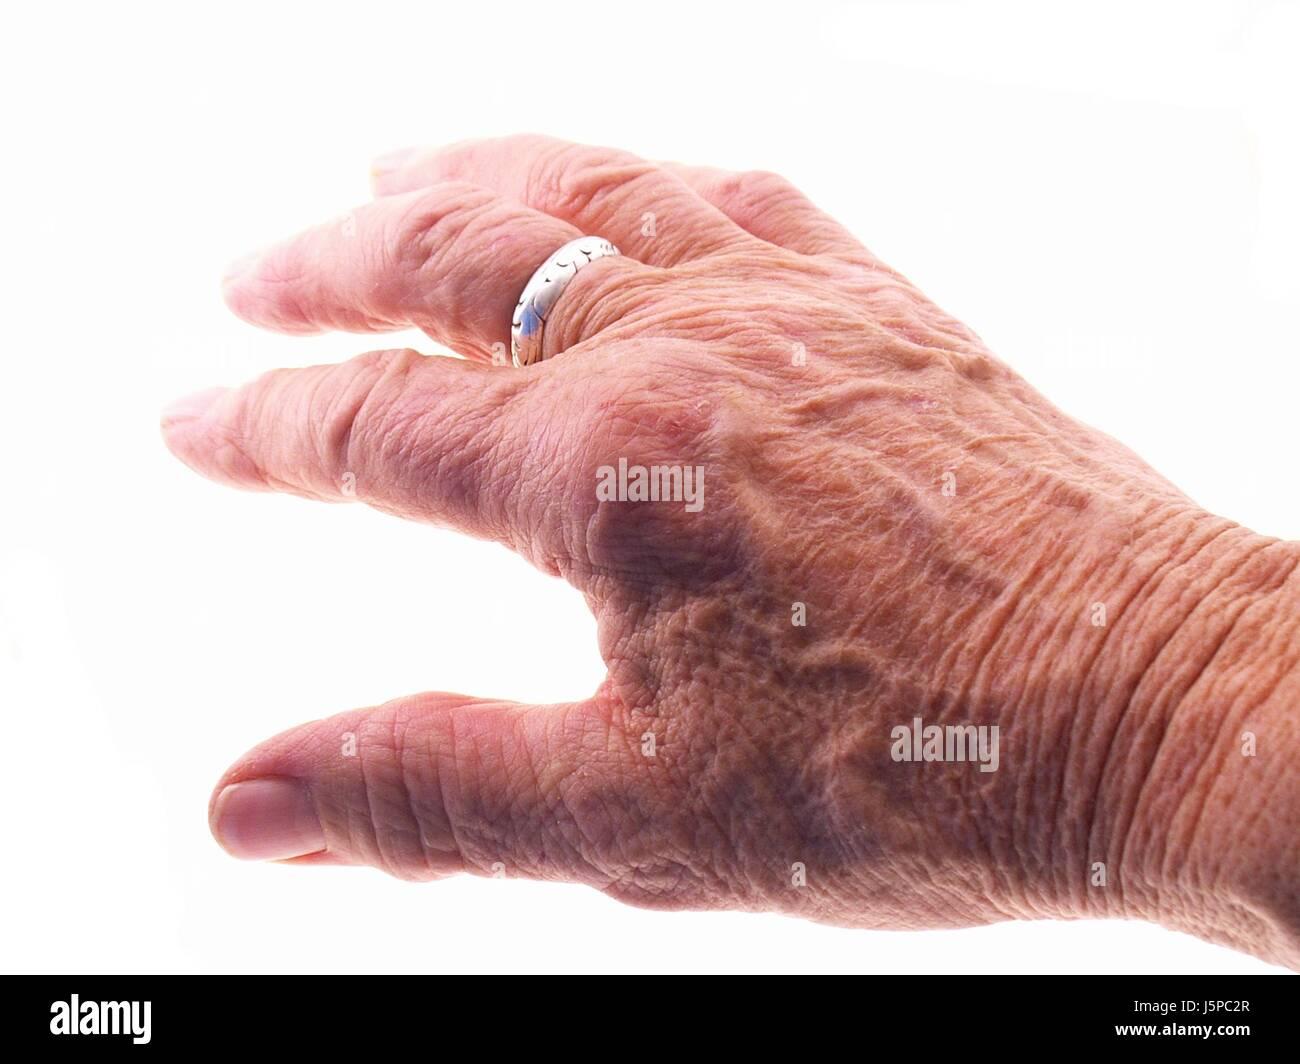 woman,hand,ring,finger,human,human being,wrinkles,old,fingenagel ...